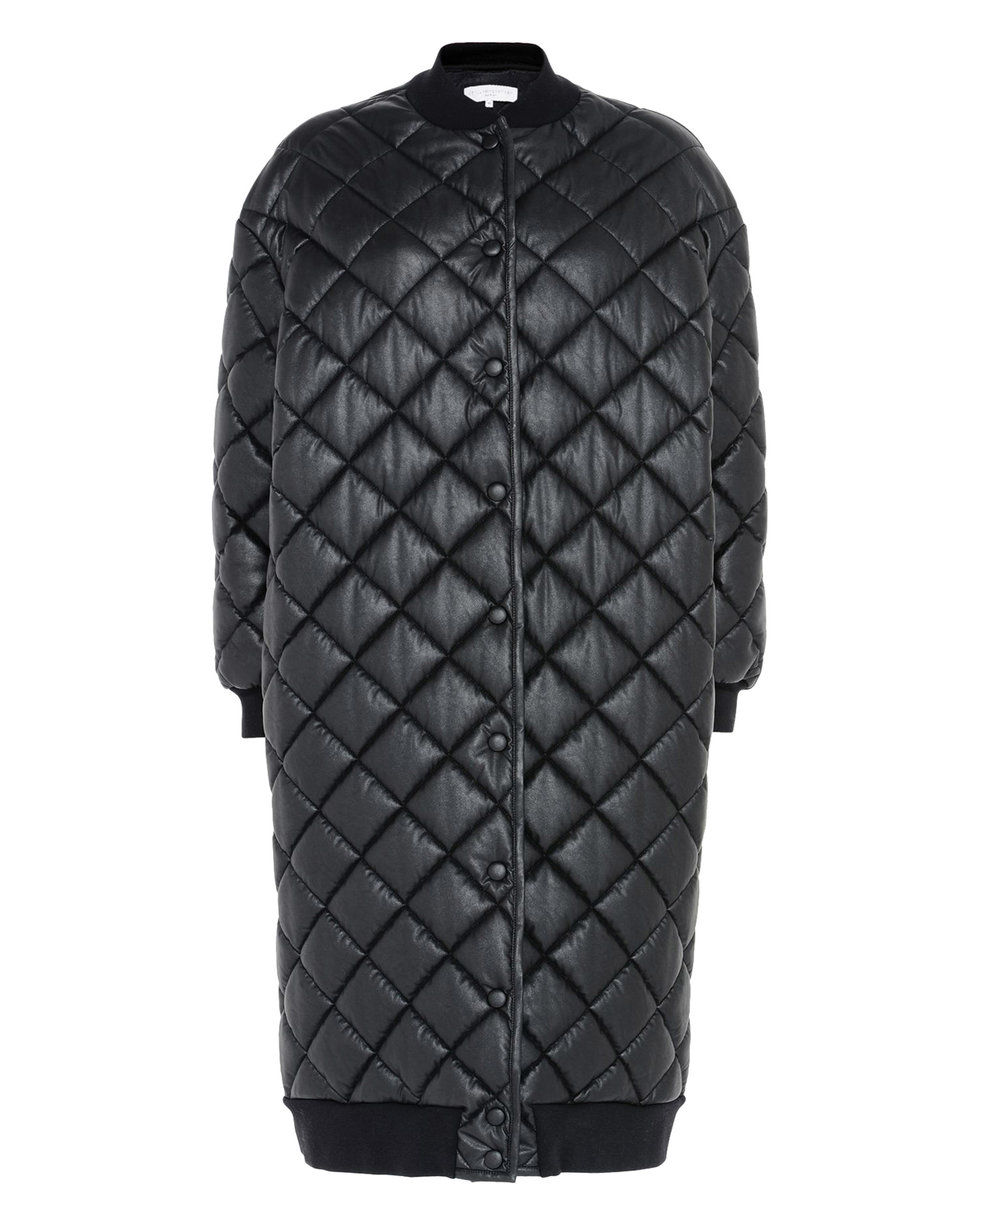 Stella McCartney Marissa Coat US$1,825